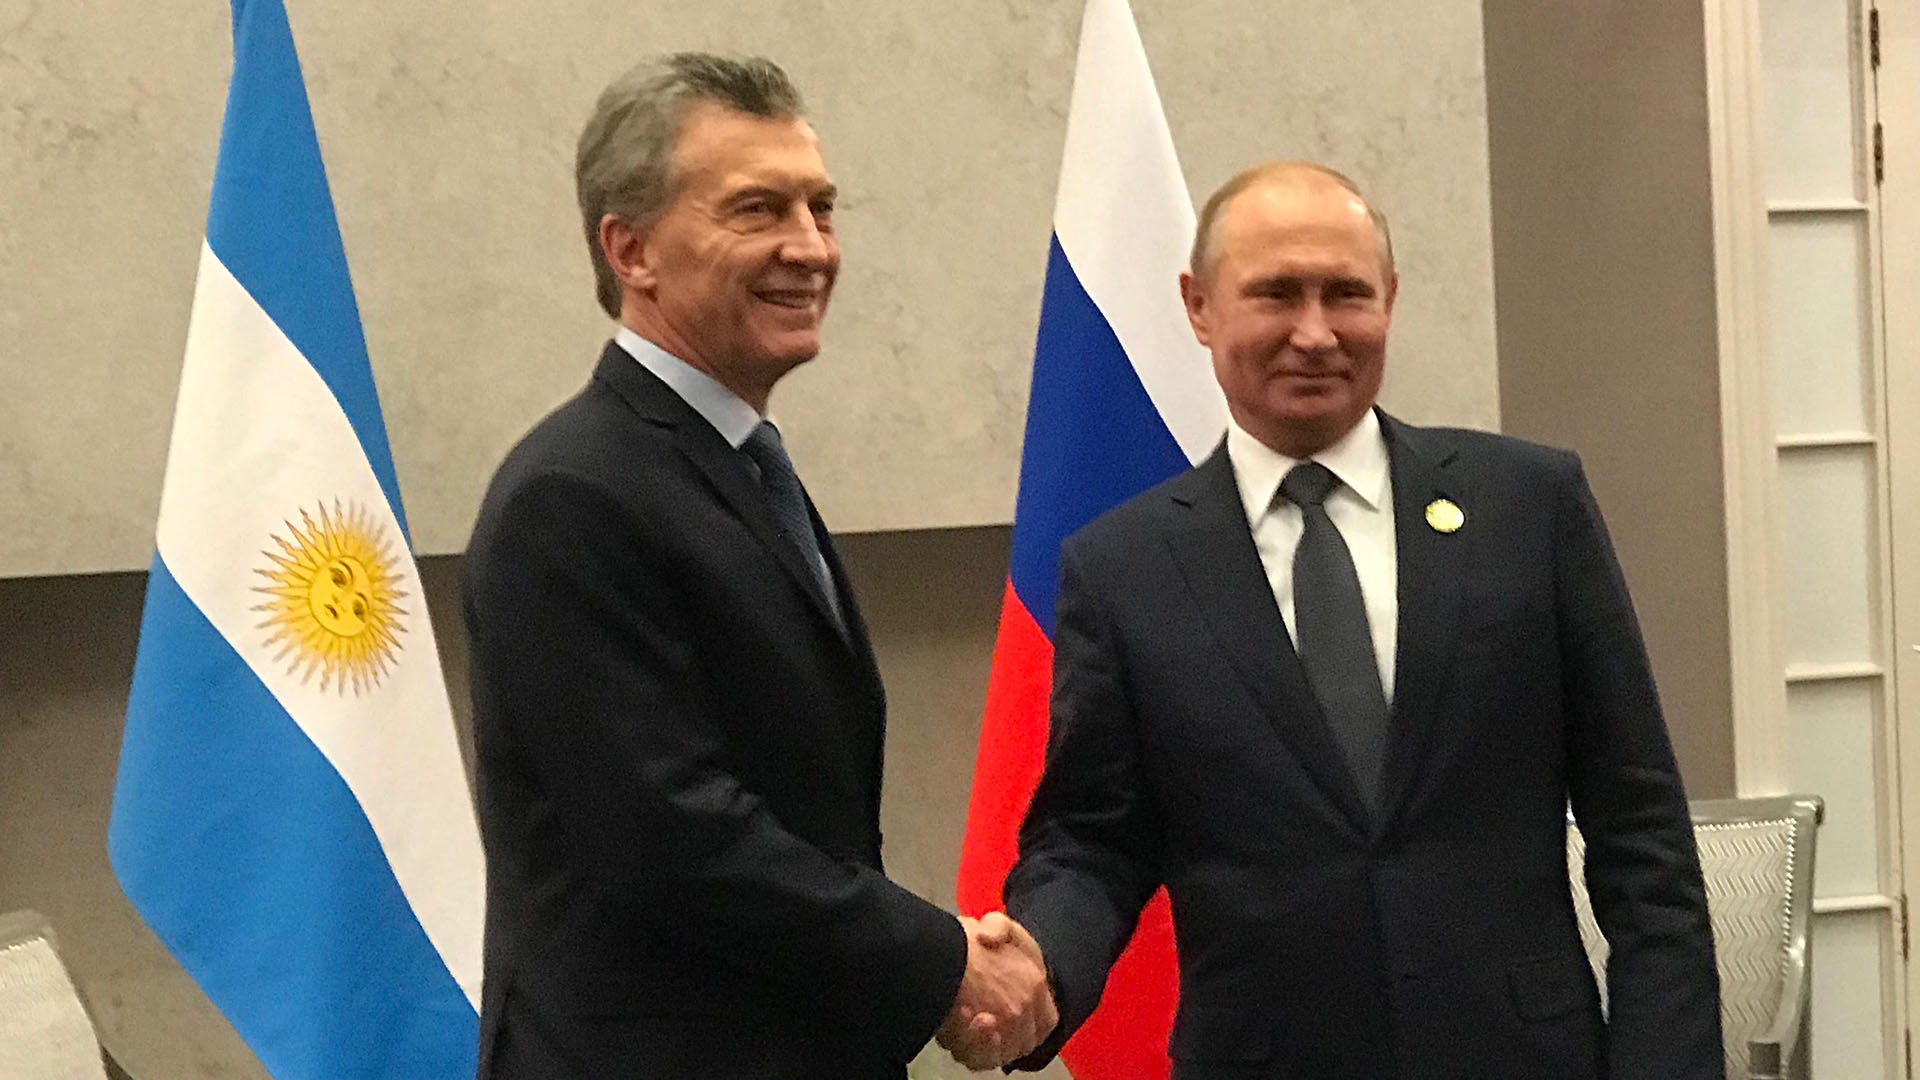 Mauricio Macri y Vladimir Putin se saludan en Sudáfrica (Foto: Presidencia)